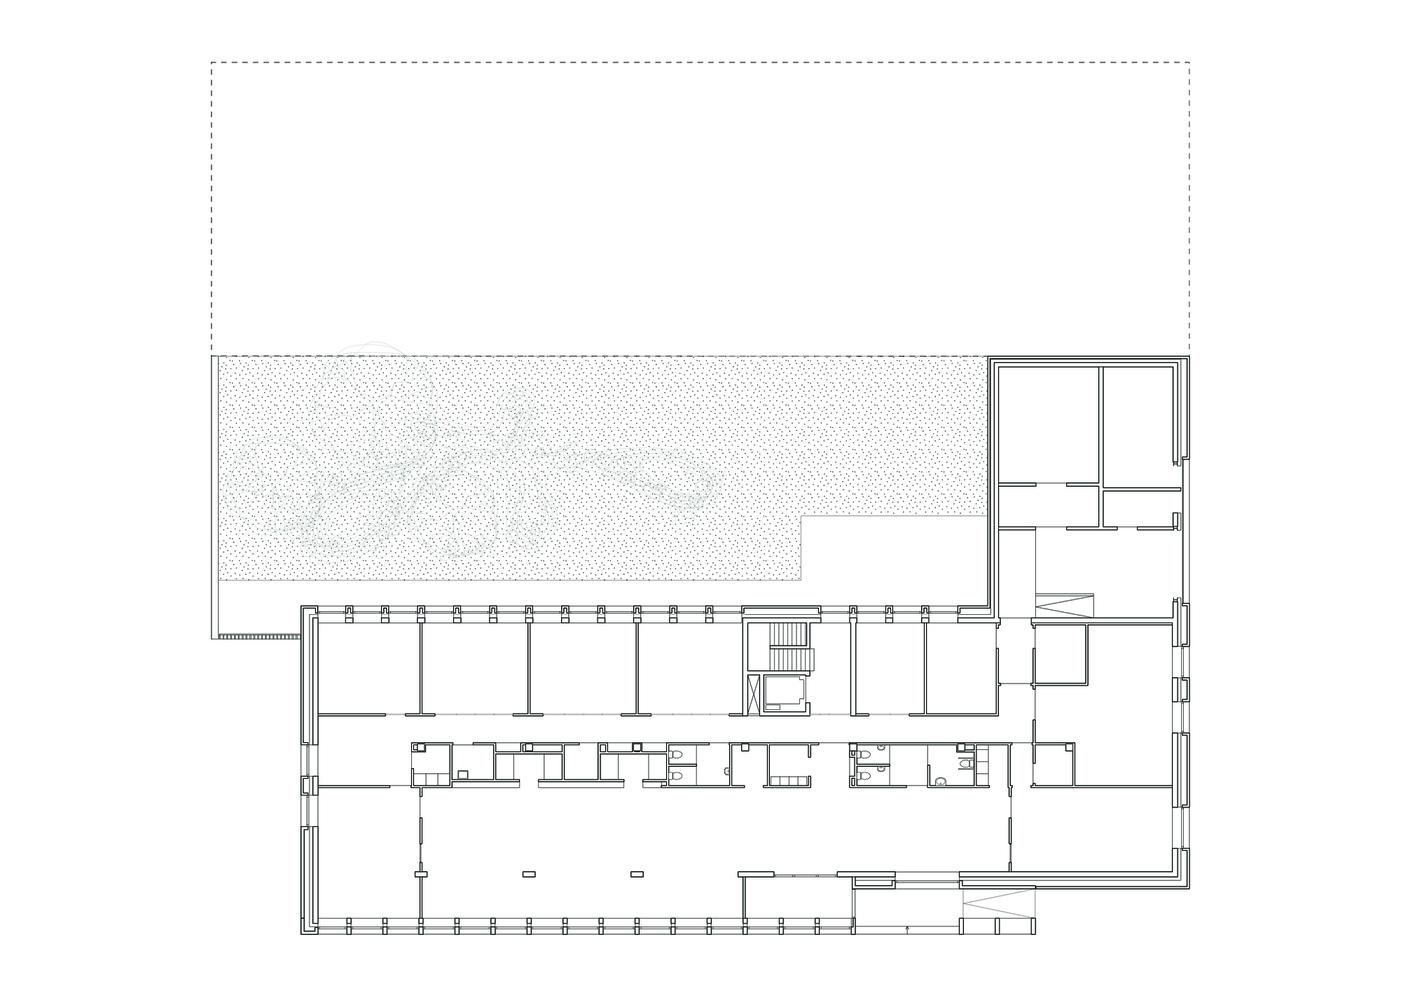 Gallery Of City Archive Delft Office Winhov Gottlieb Paludan Architects 12